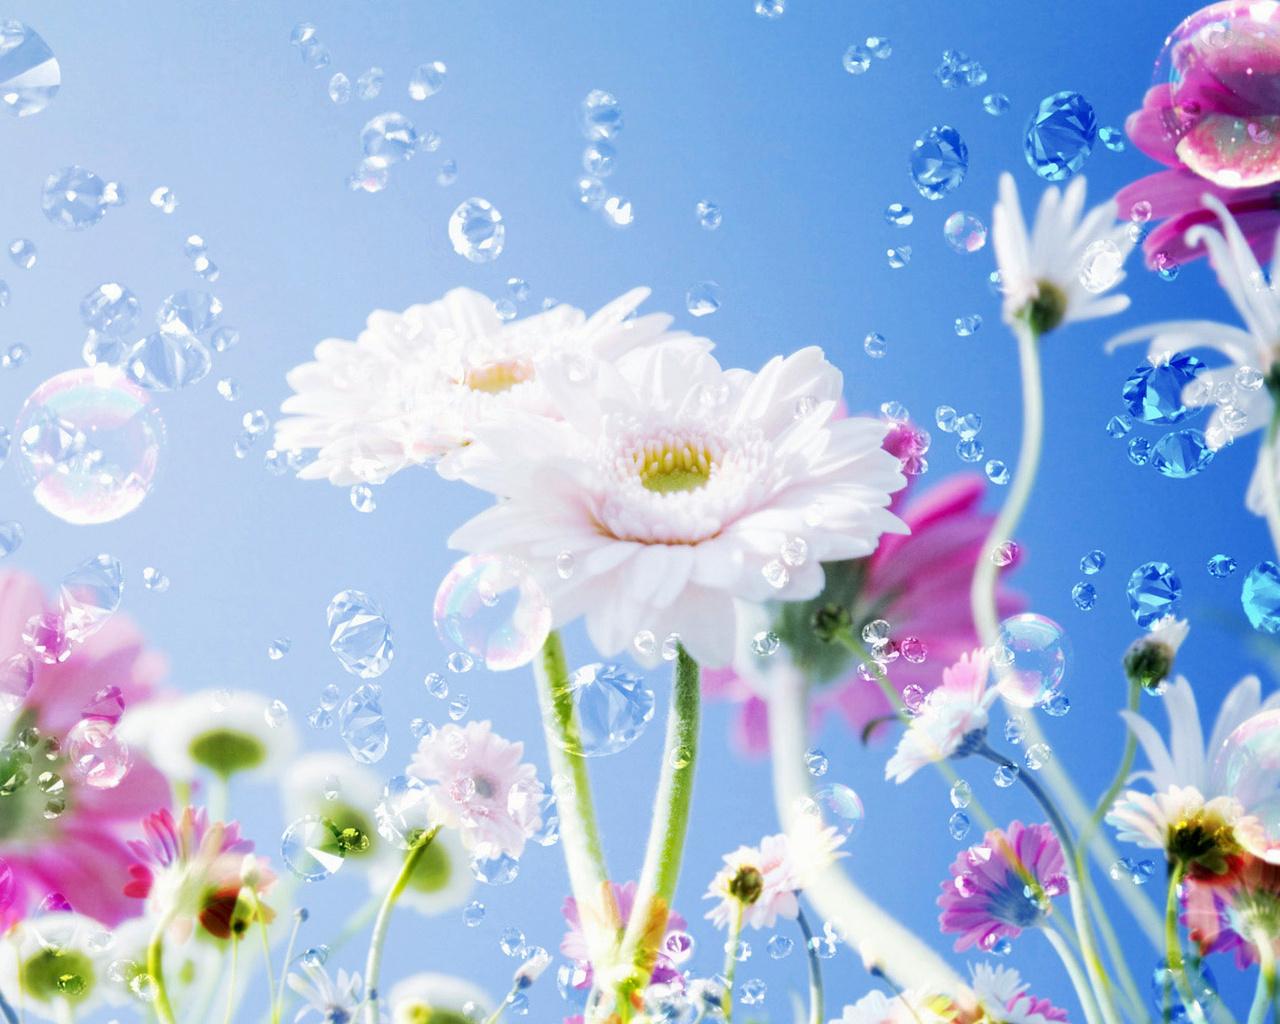 Mahir Tikcom Blog Archive Wallpaper Flower 30 Gambar